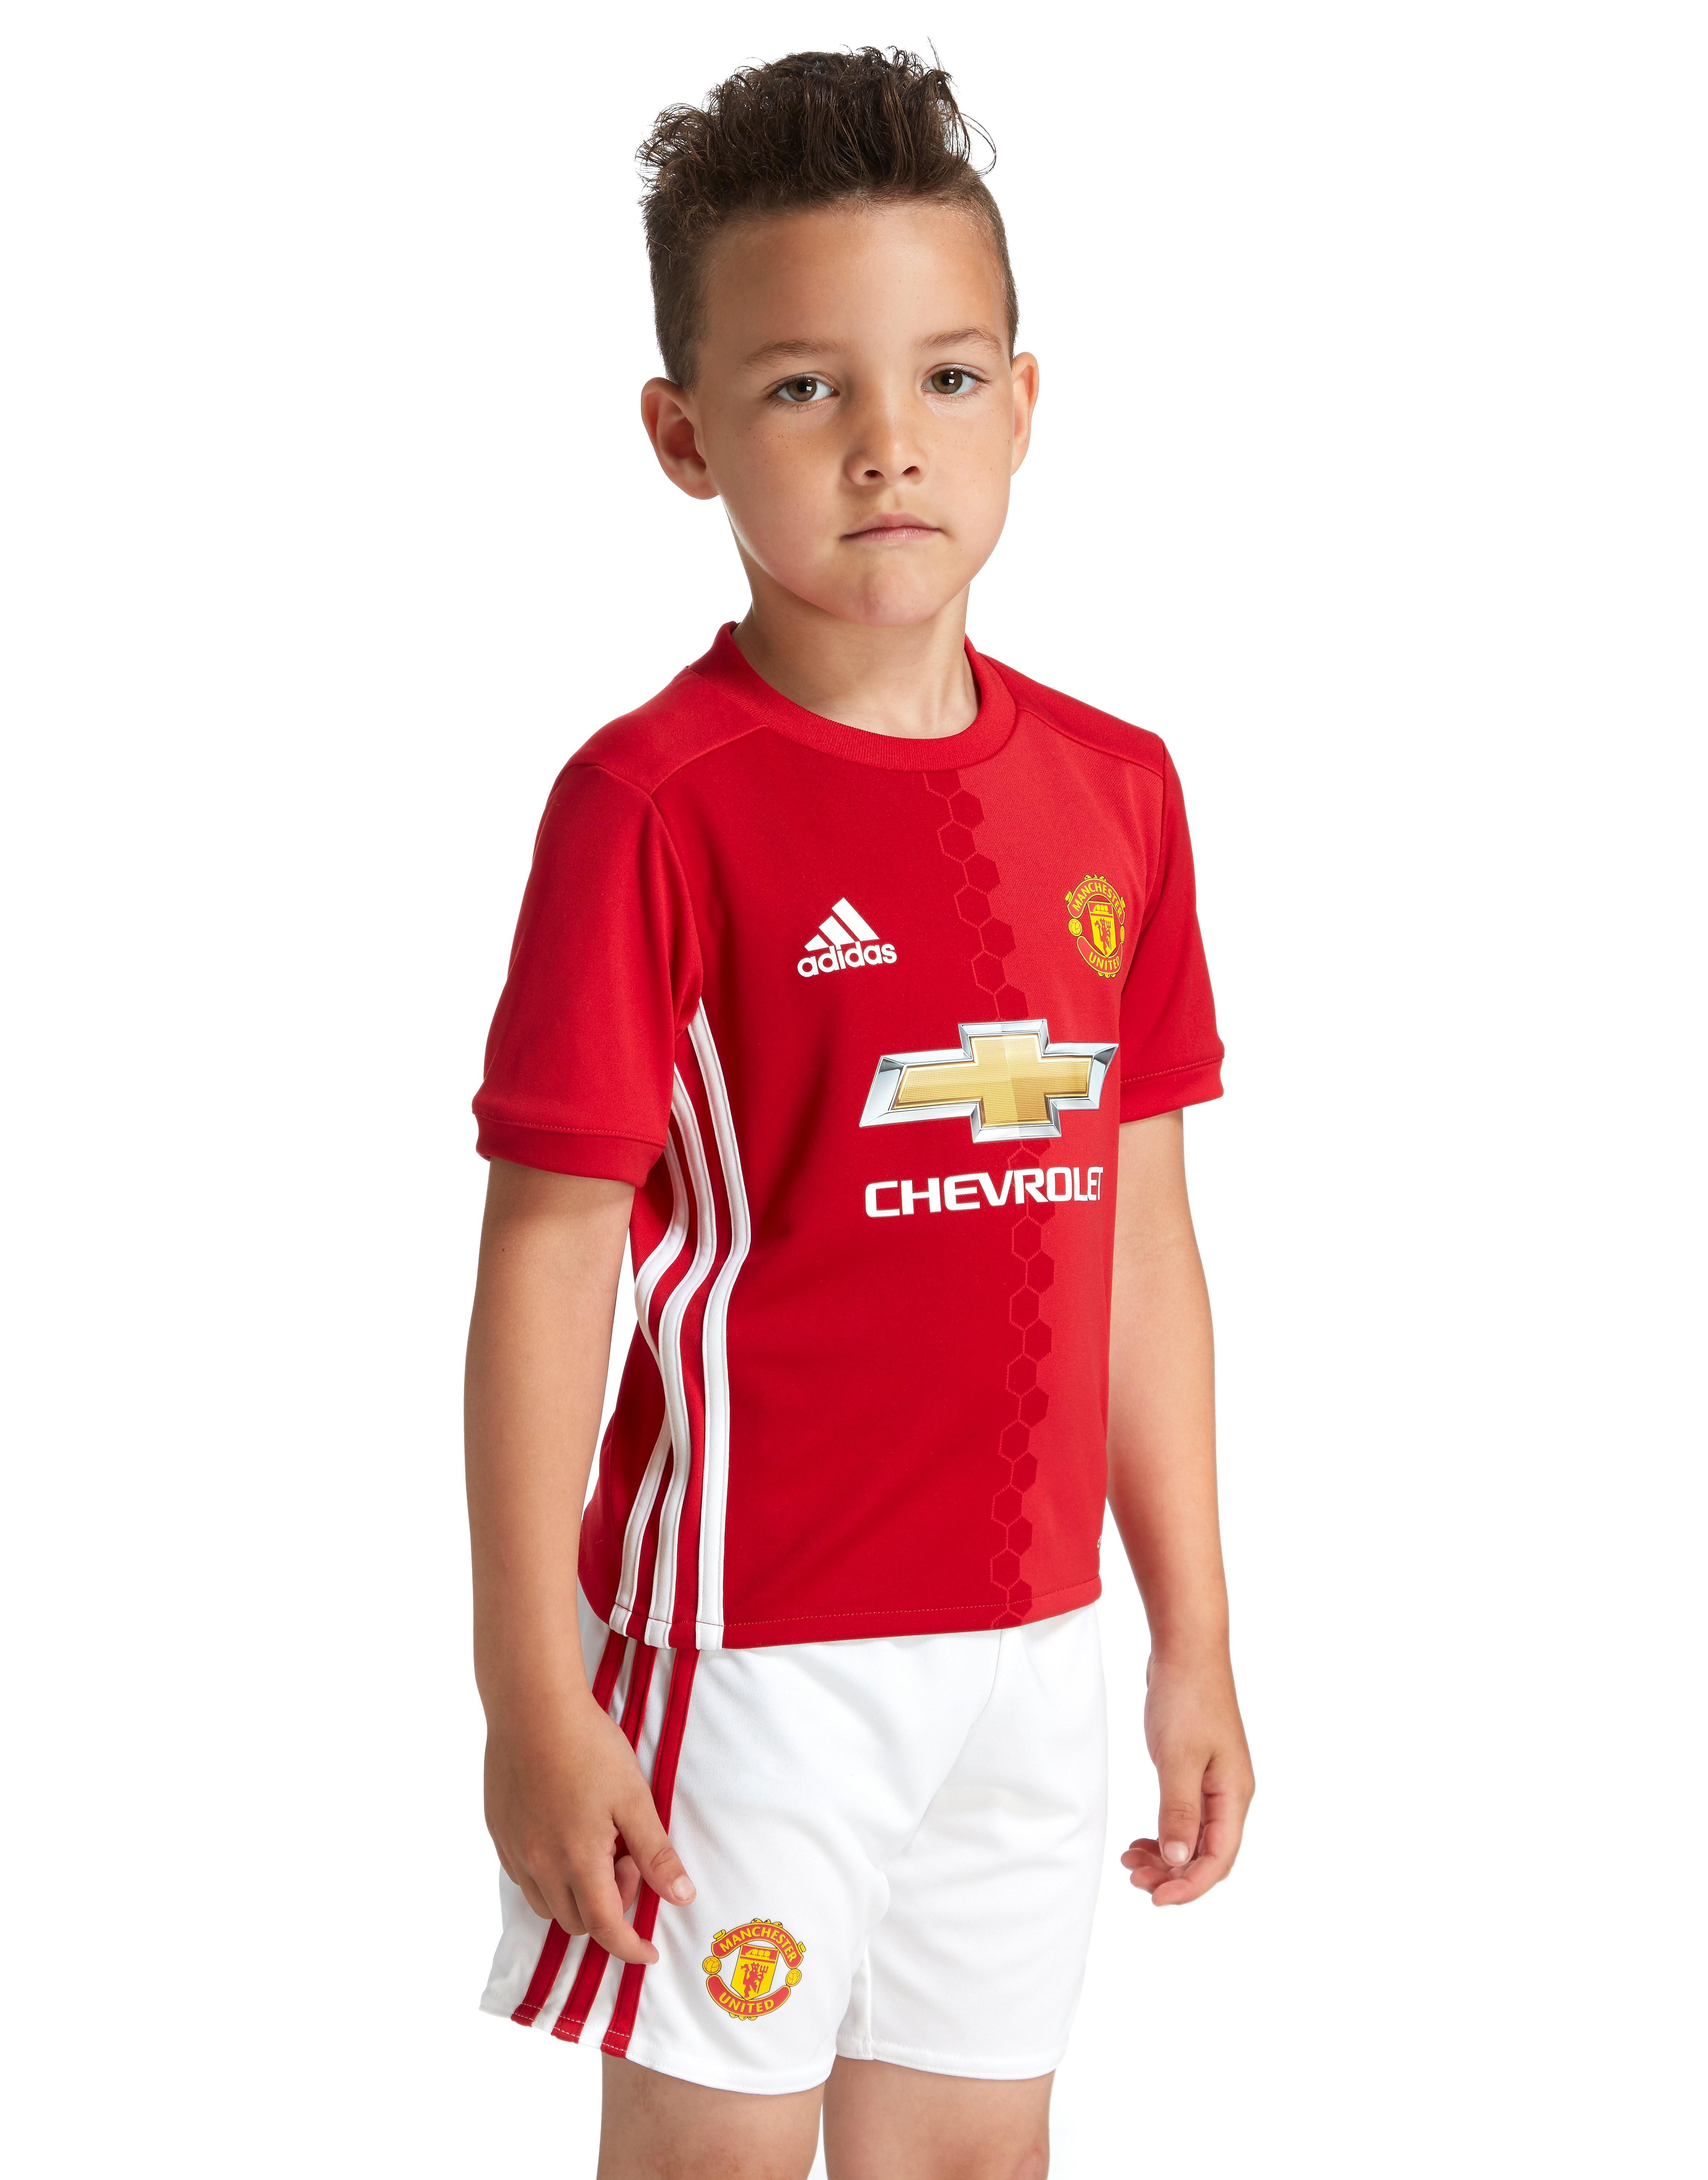 adidas Manchester United FC 2016/17 Home Kit Children